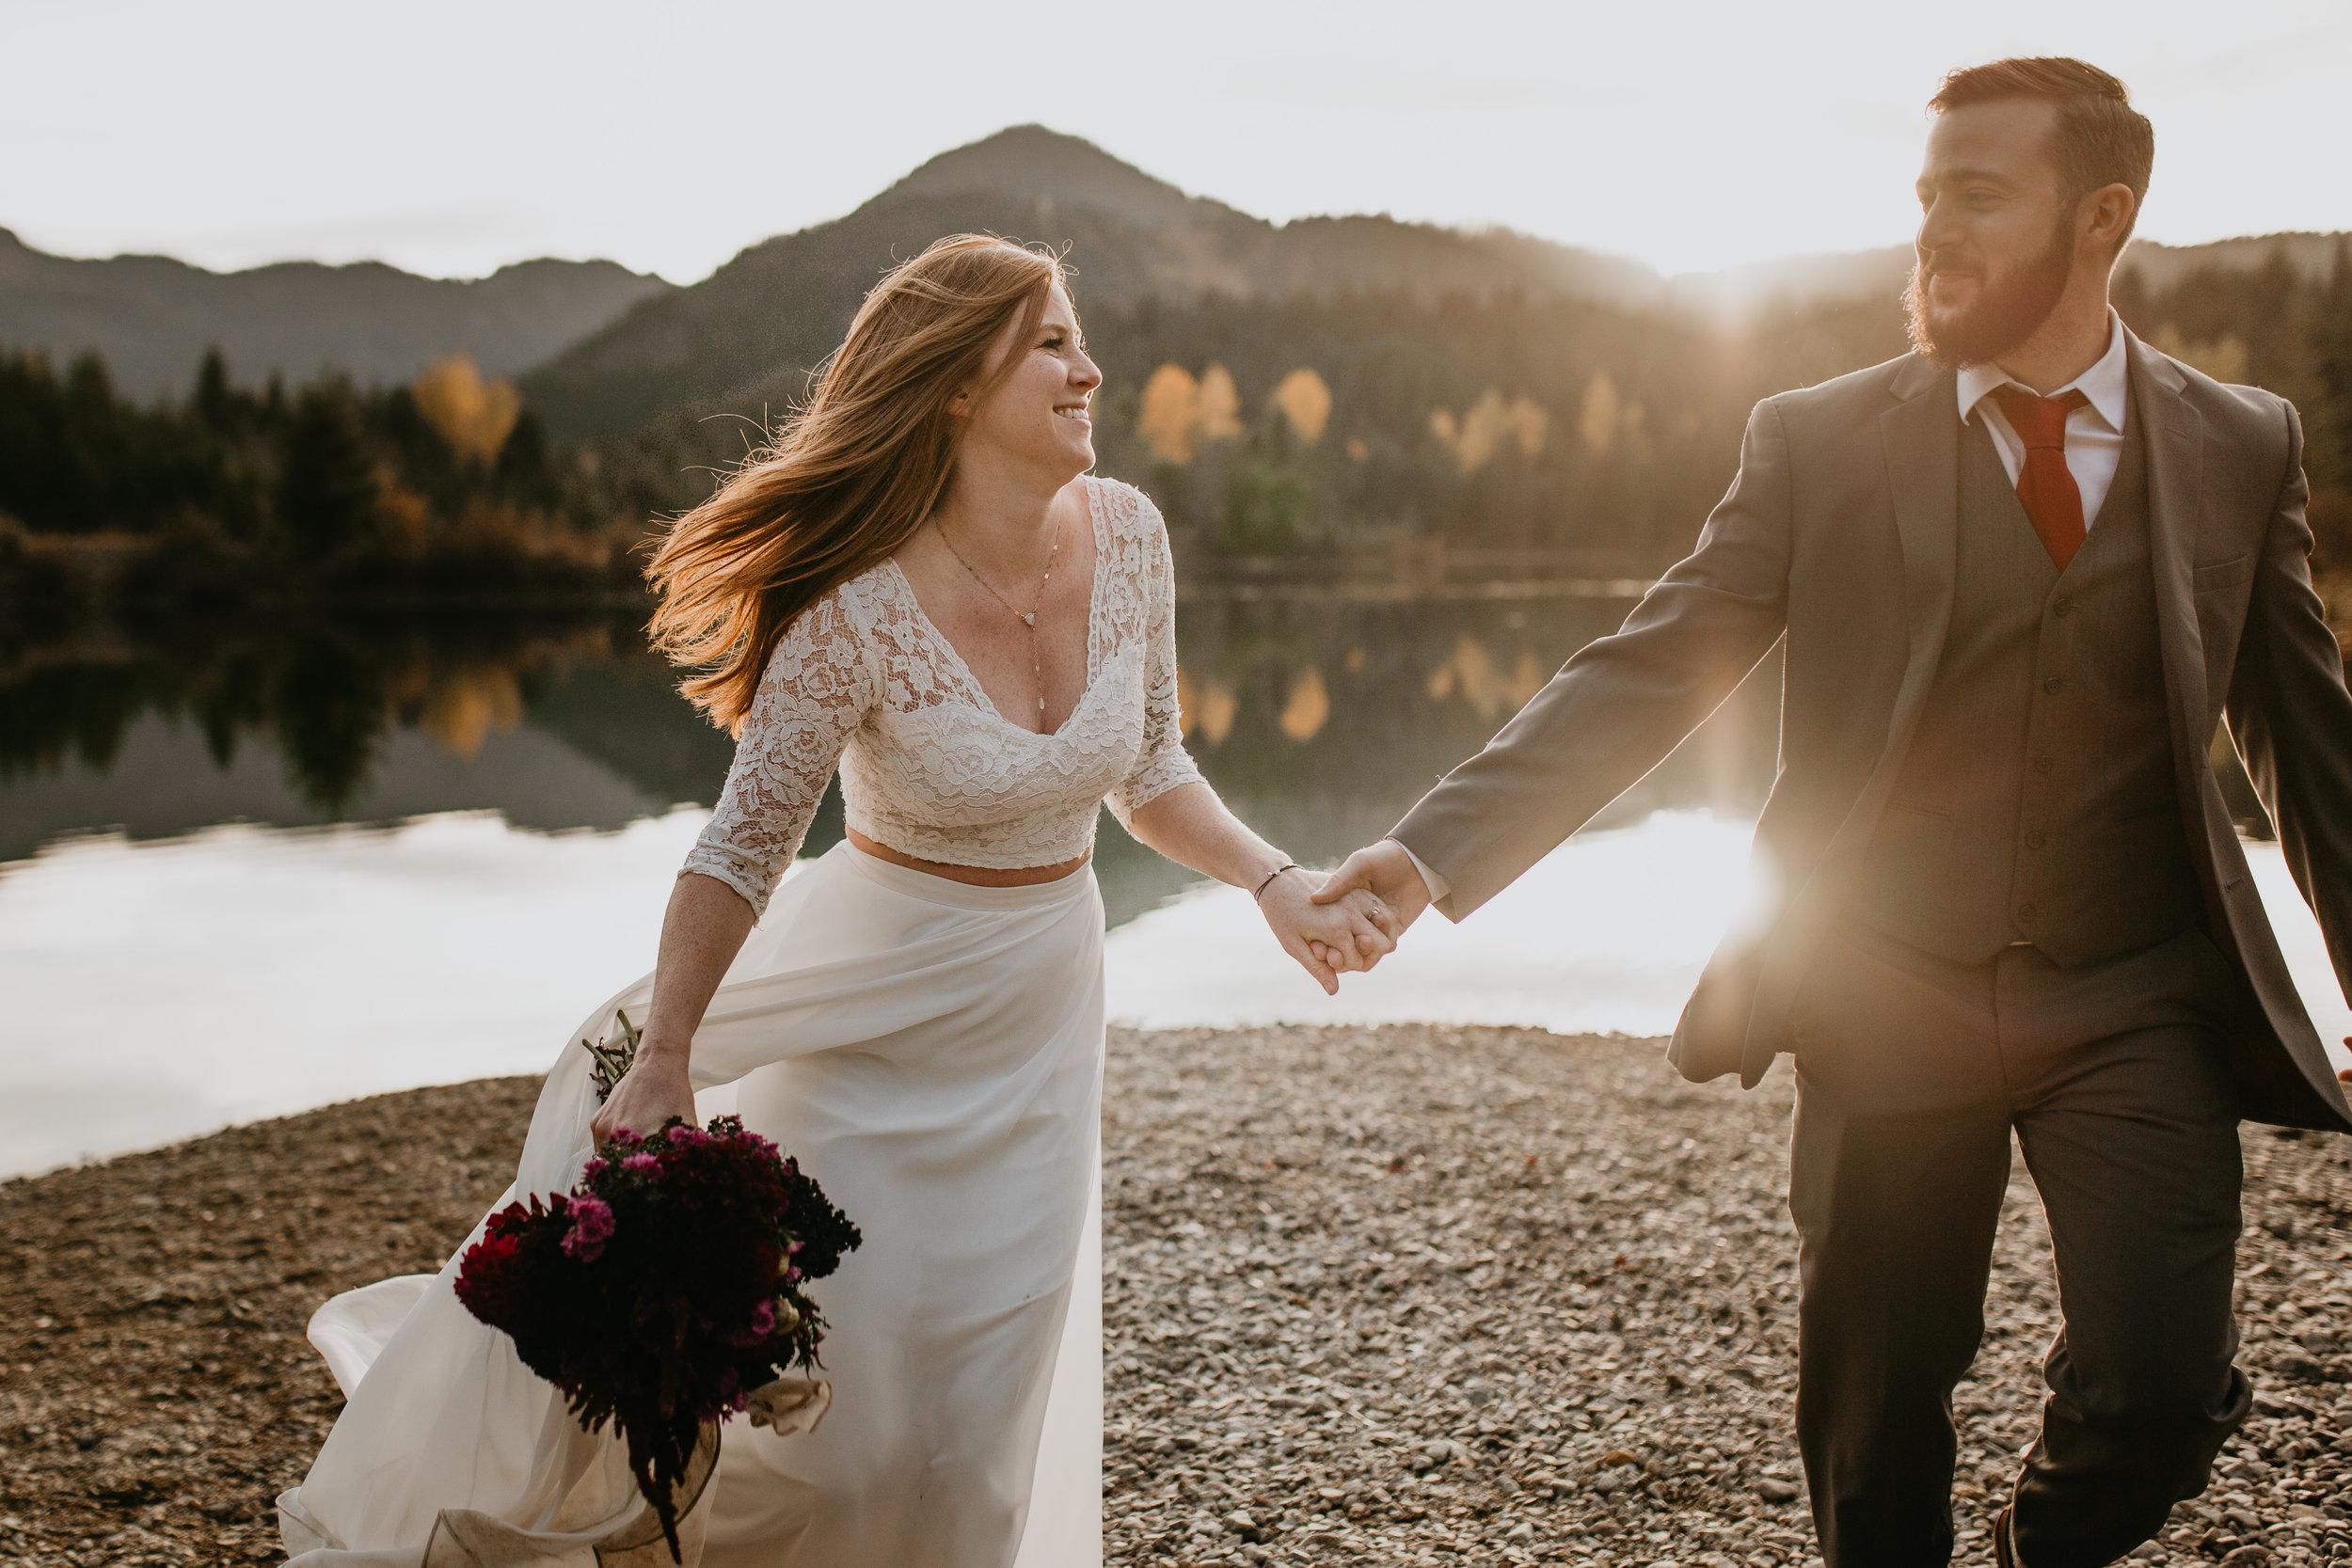 nicole-daacke-photography-mountain-view-elopement-at-gold-creek-pond-snoqualmie-washington-wa-elopement-photographer-photography-adventure-elopement-in-washington-fall-lakeside-golden-sunset-boho-fun-bride-0420.jpg